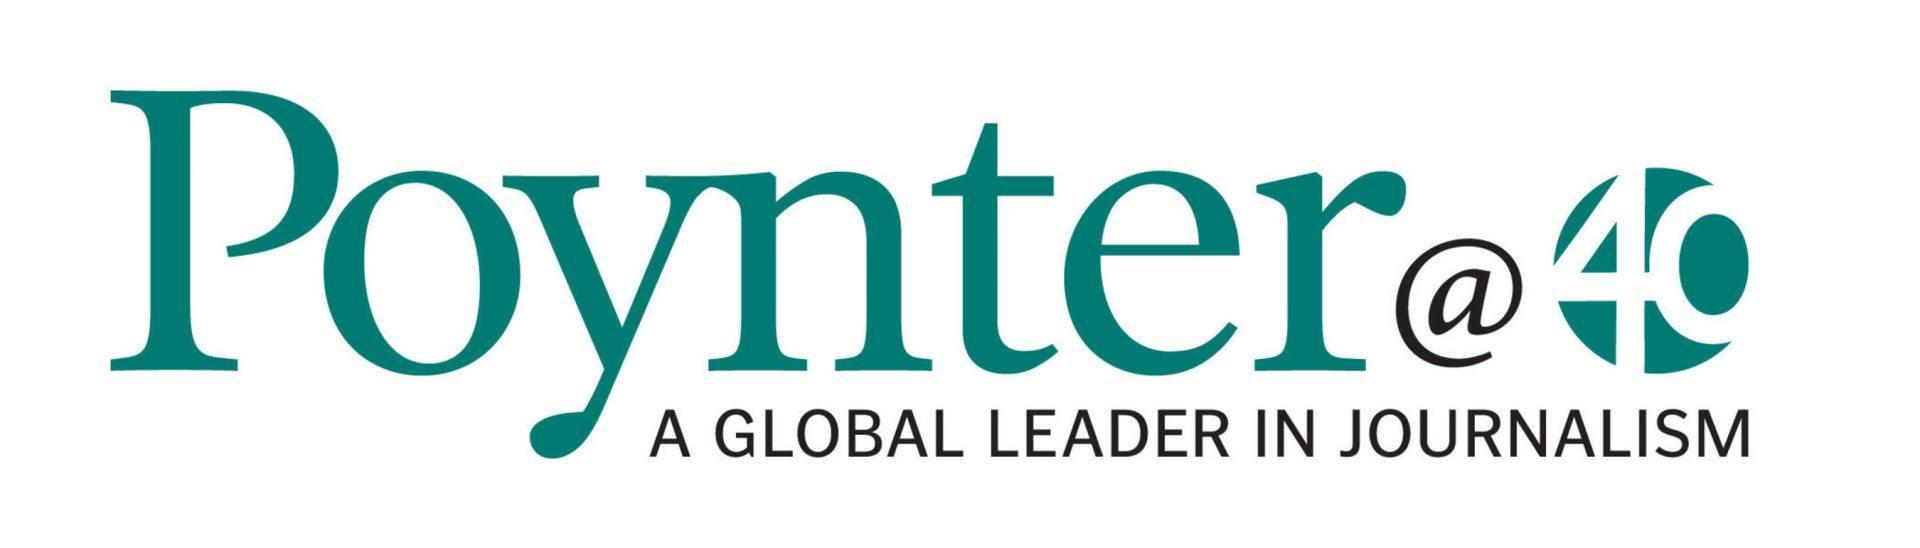 Poynter 40th Anniversary Logo